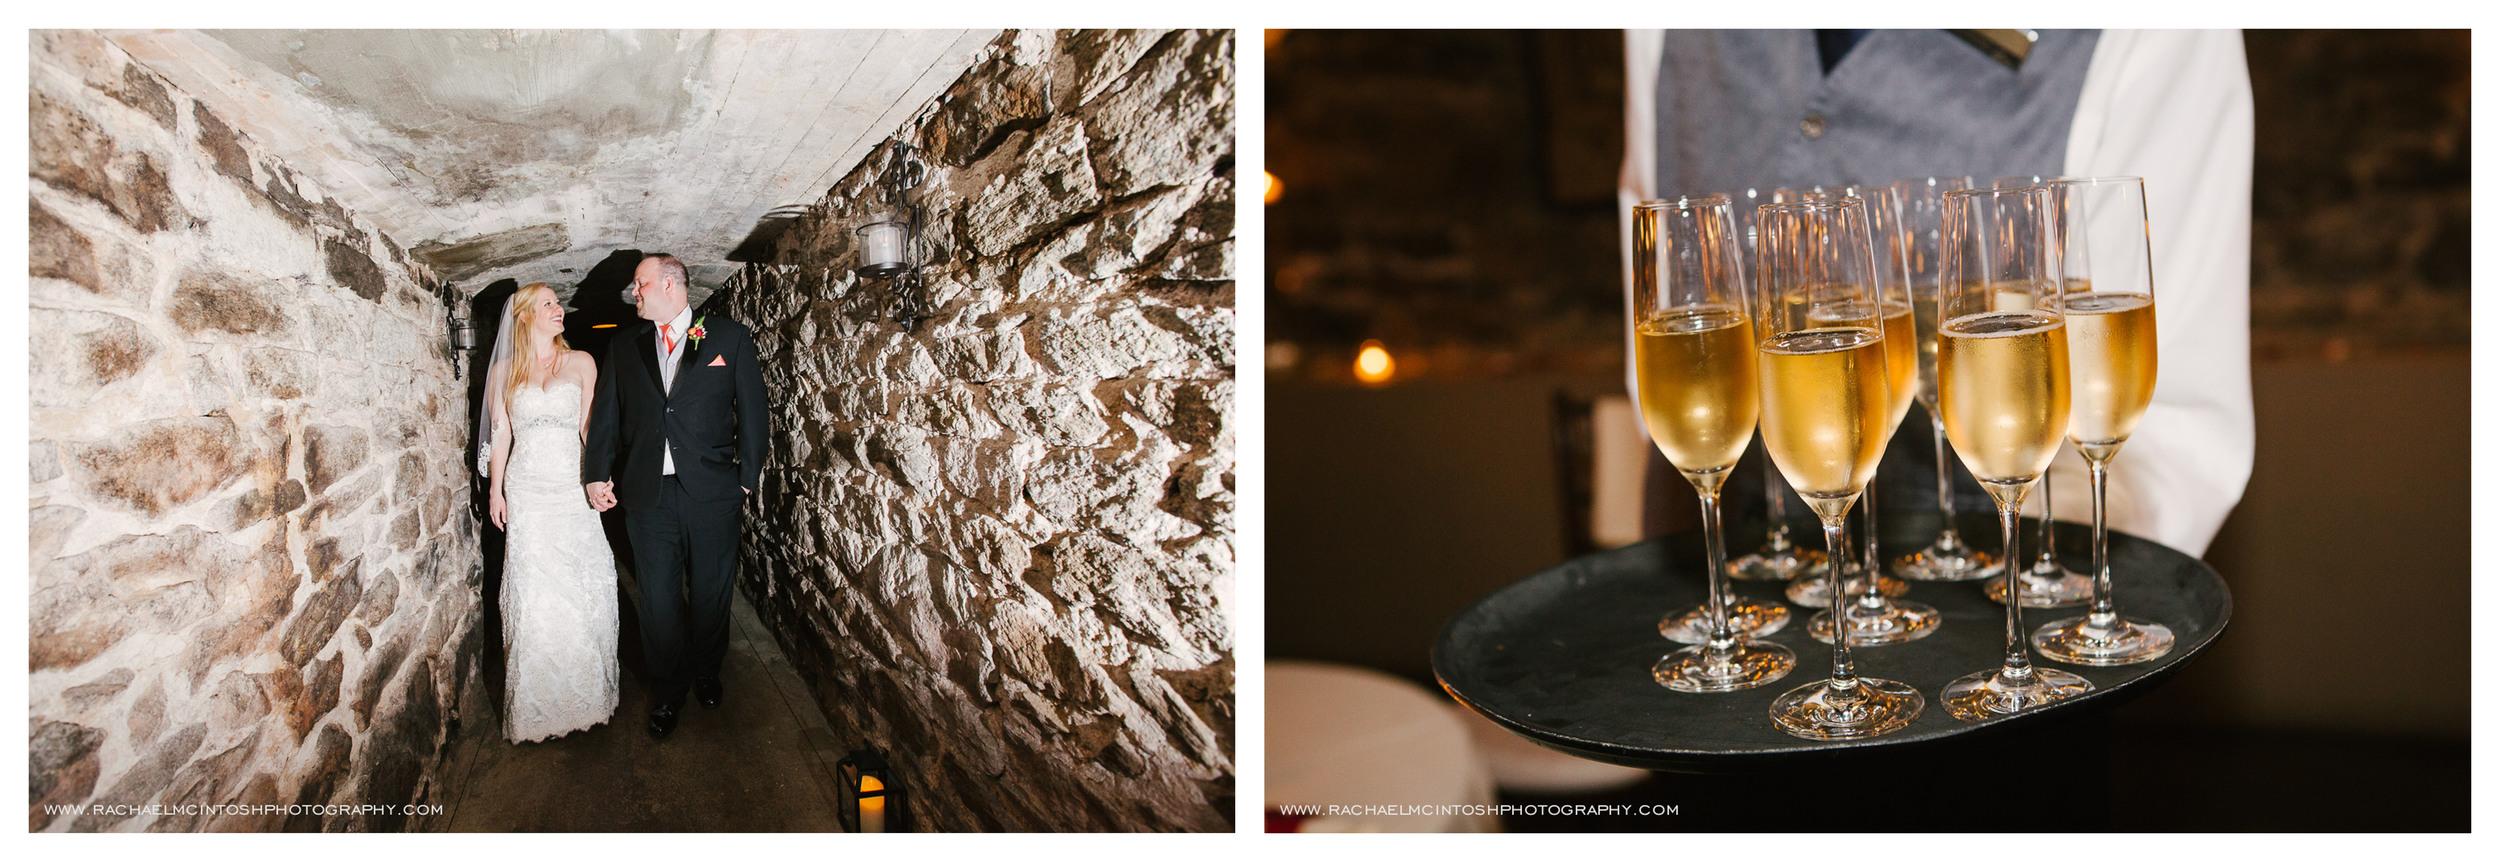 Biltmore Champagne Cellar Tunnels 1.jpg